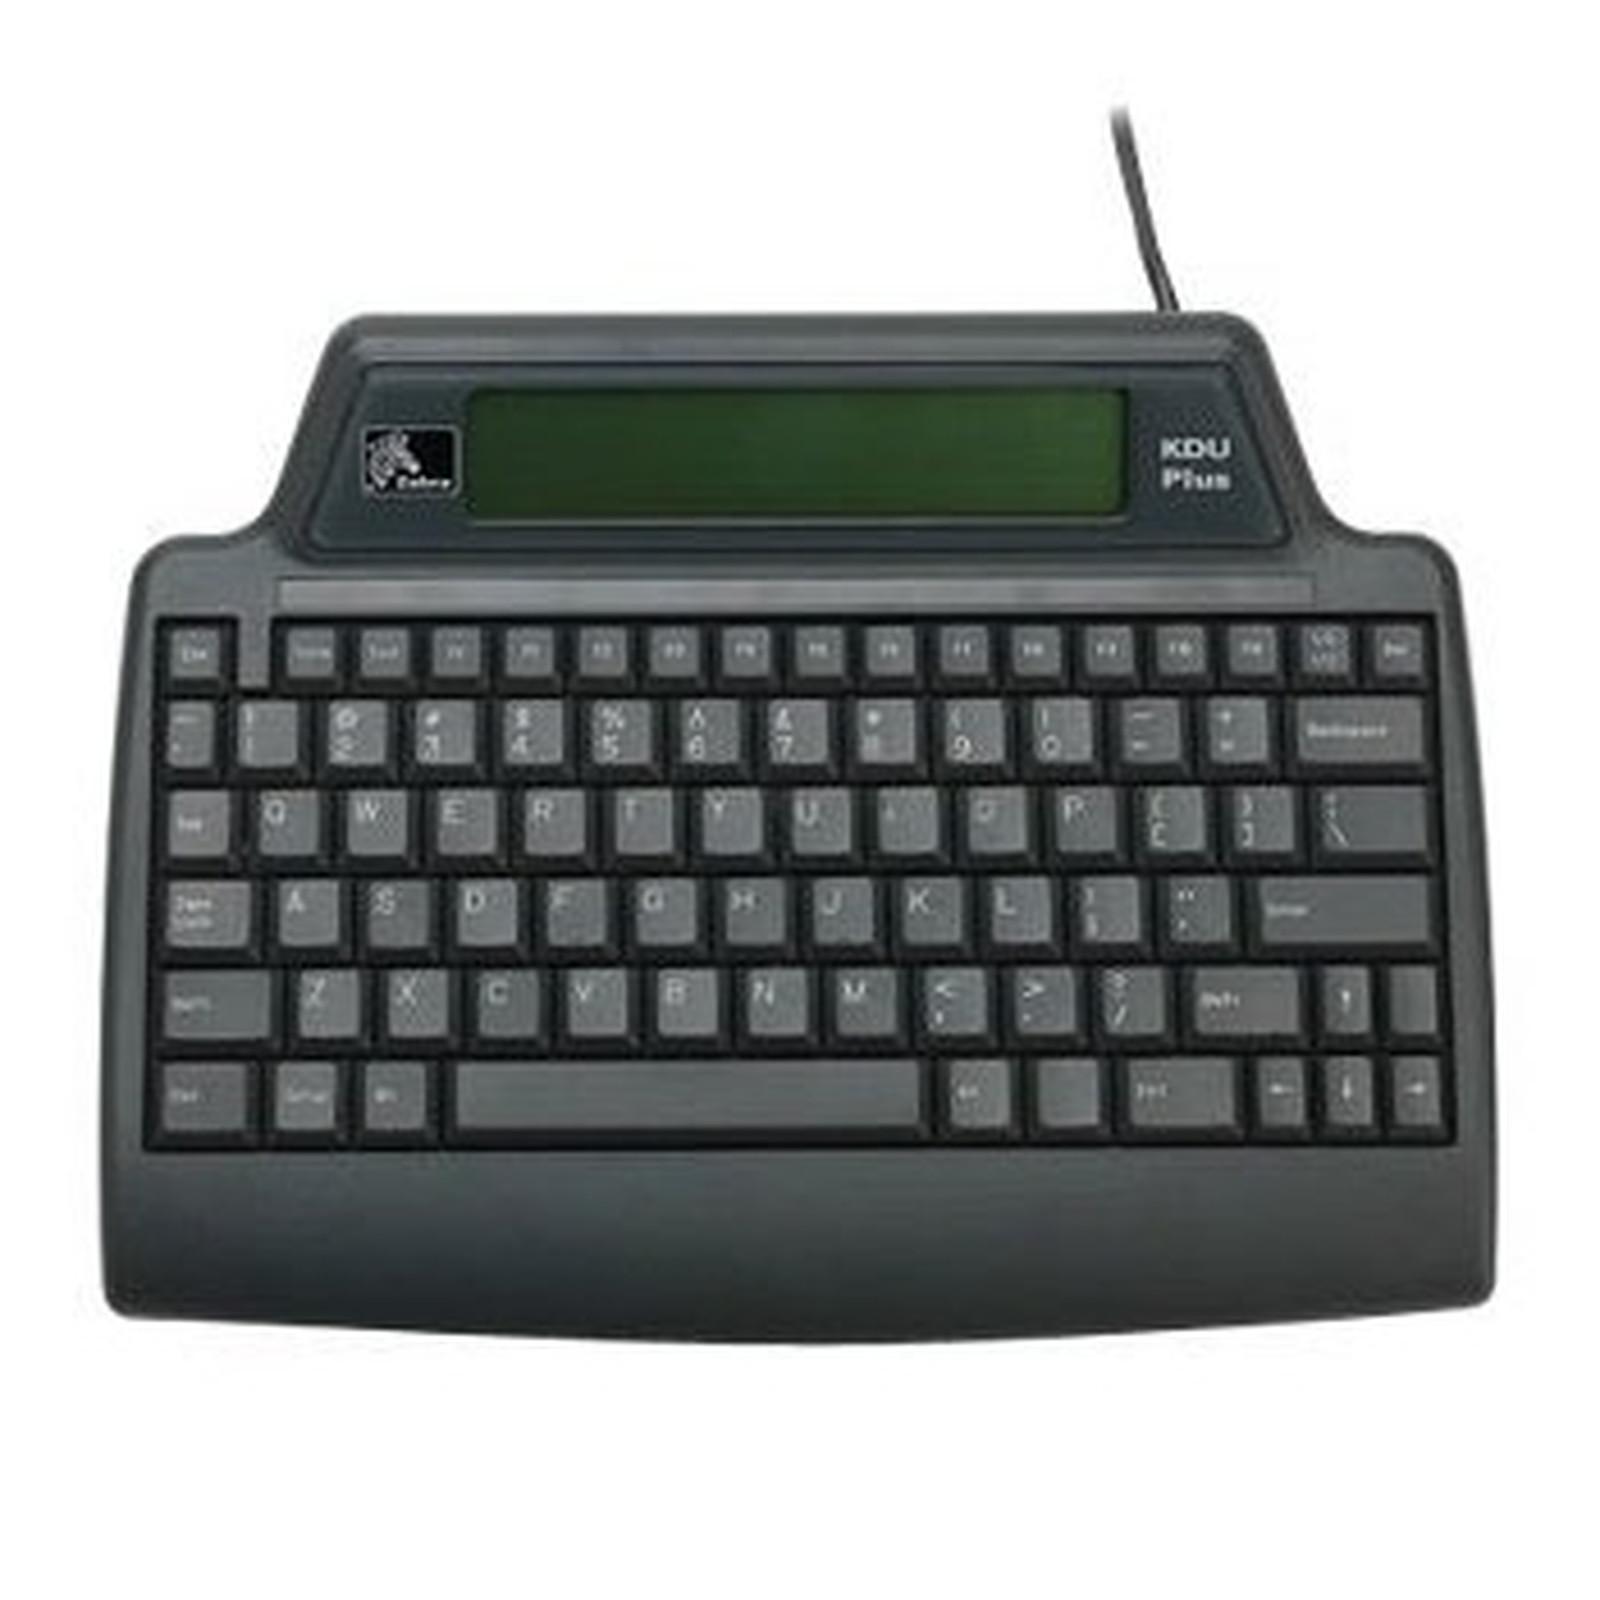 Zebra Technologies KDU Plus